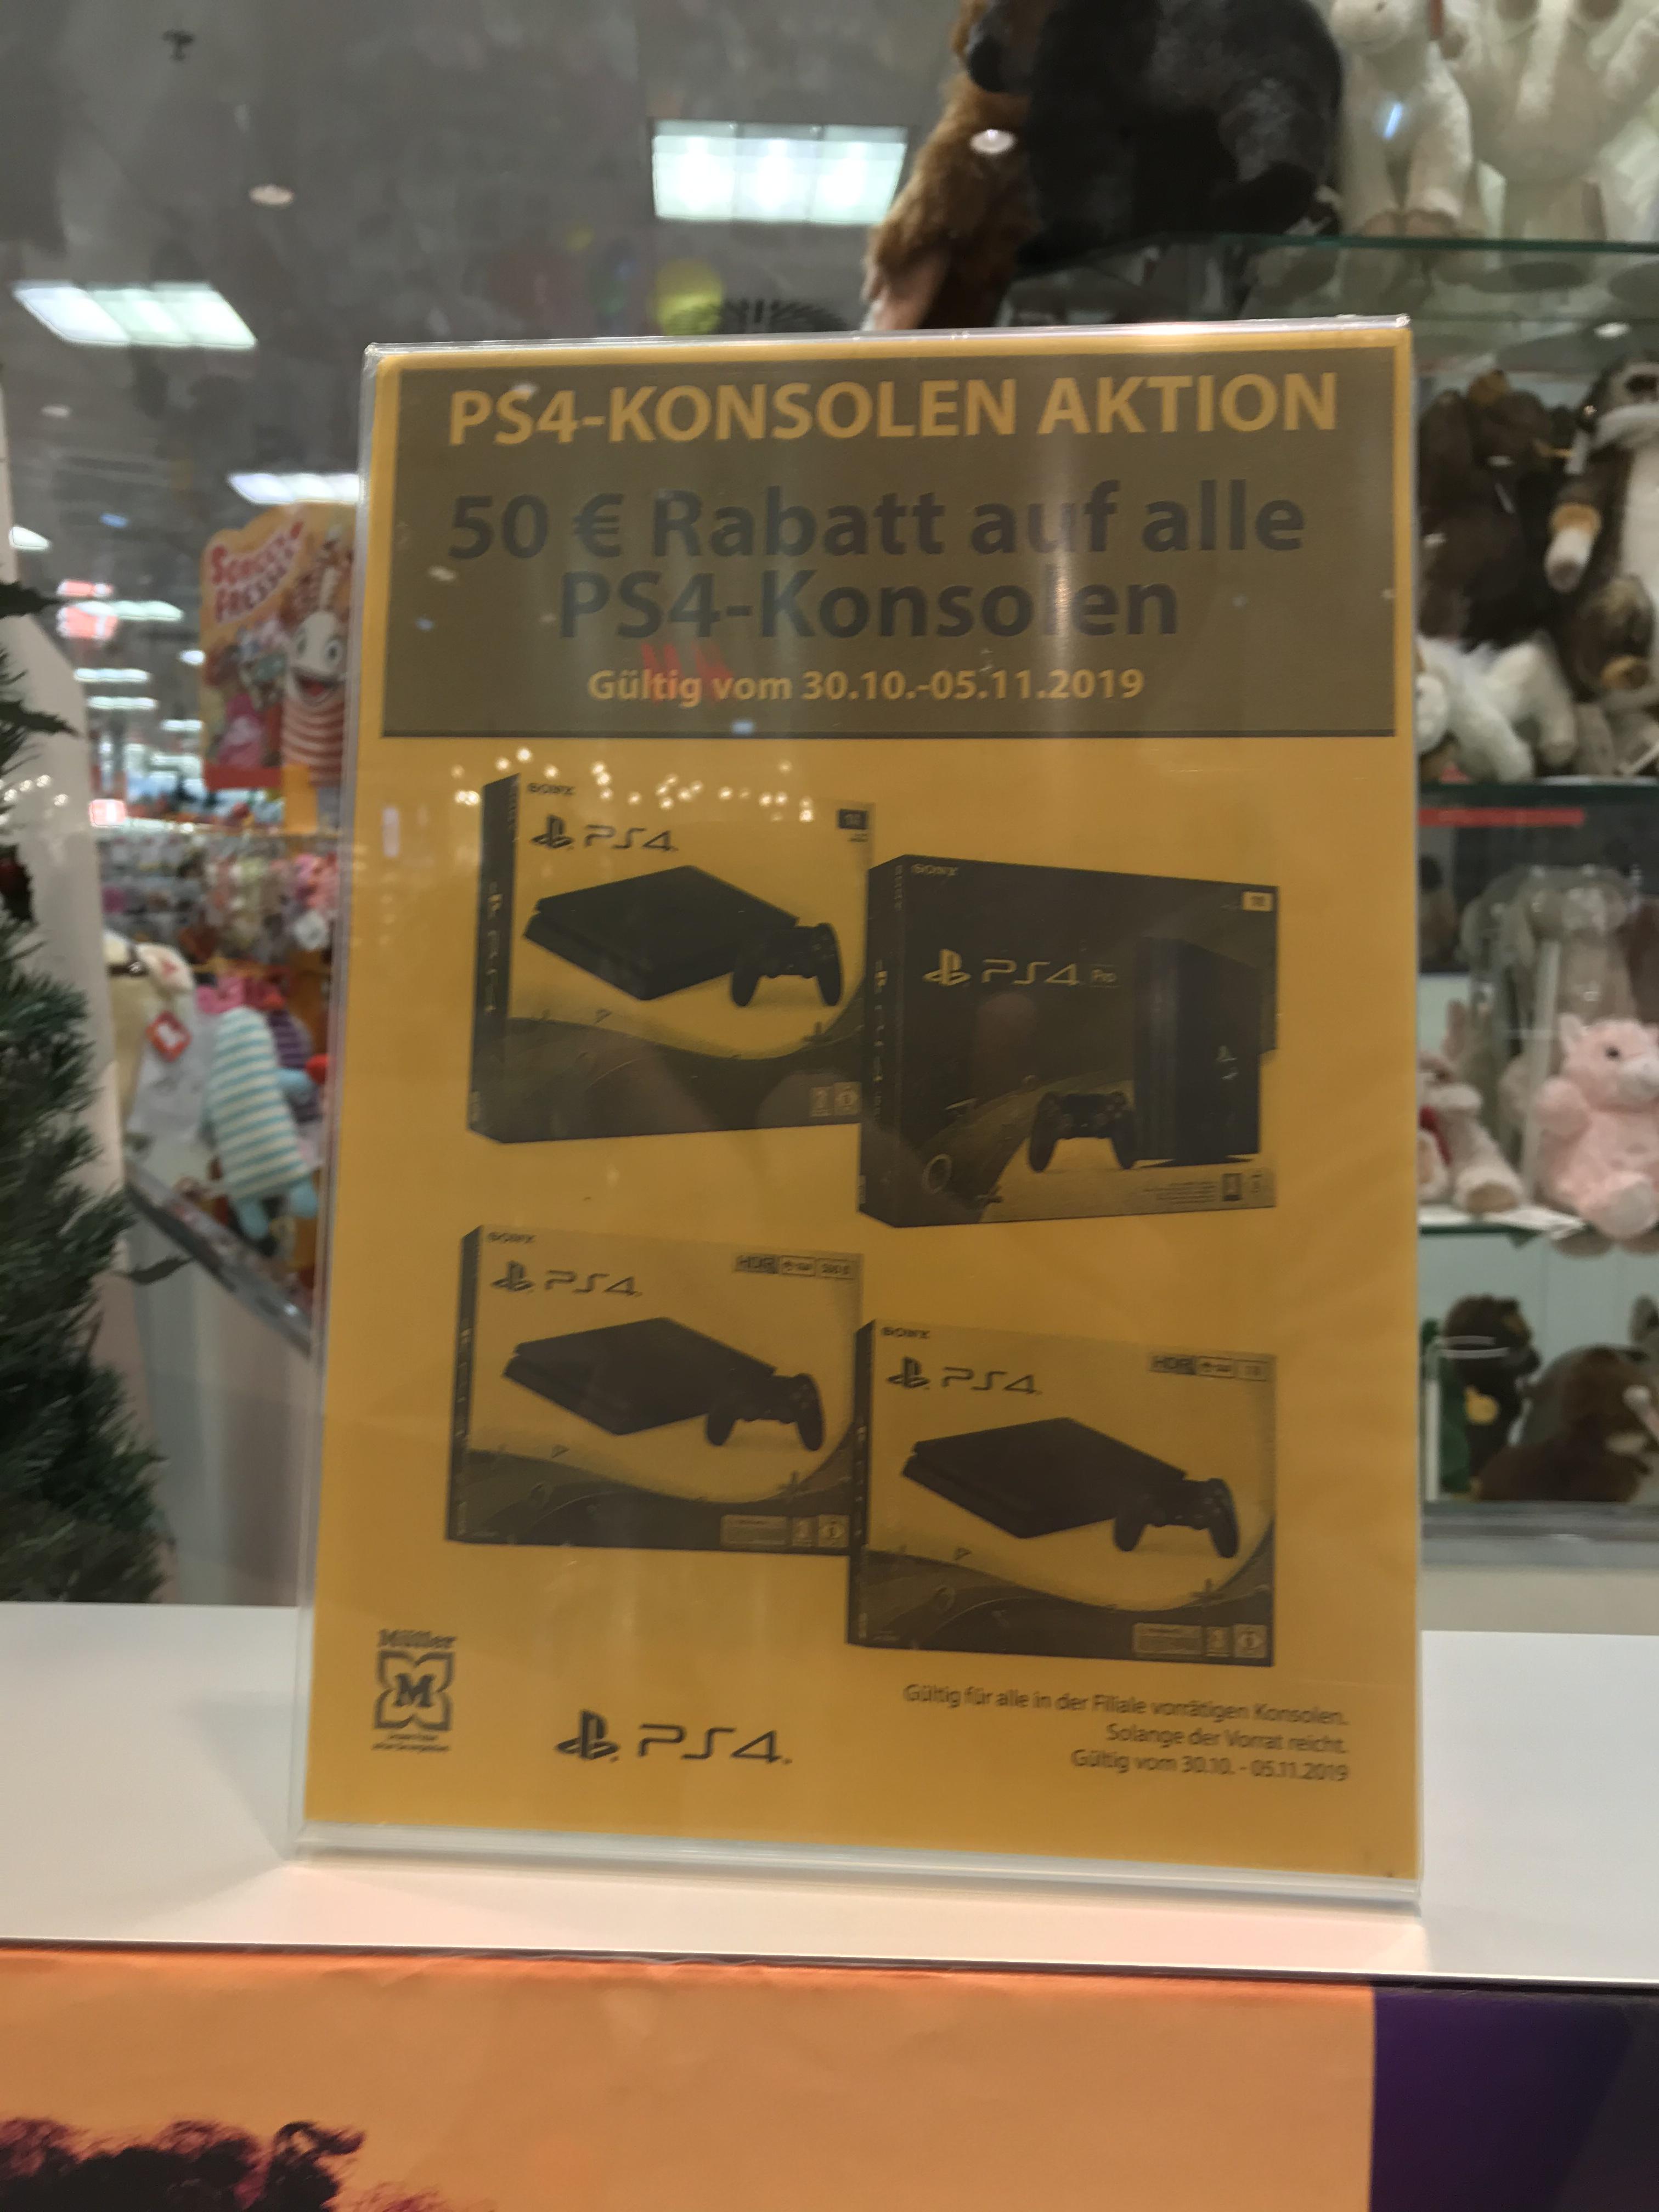 50 Euro Rabatt auf PS4 Konsolen bei Müller